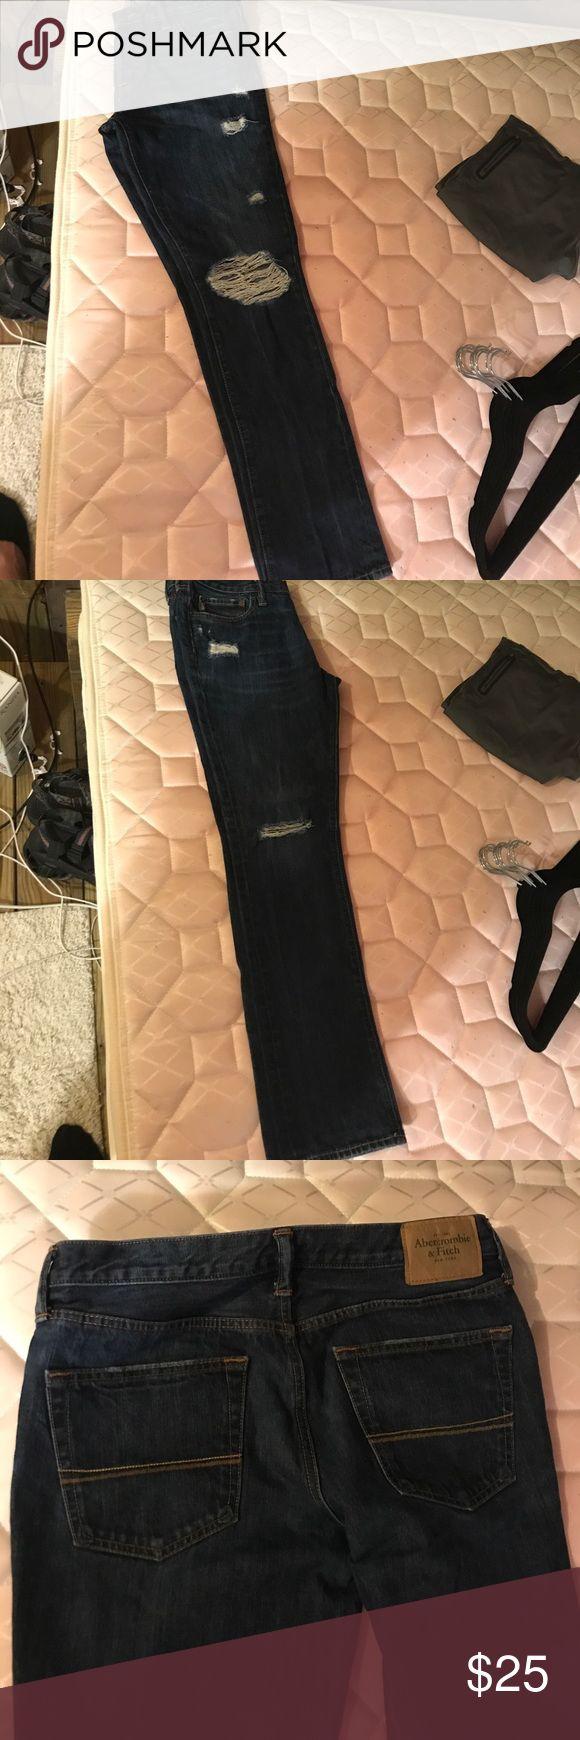 Abercrombie Men's Skinny Jeans Size 33, 32 dark wash distressed men's Abercrombie skinny jeans Abercrombie & Fitch Jeans Skinny